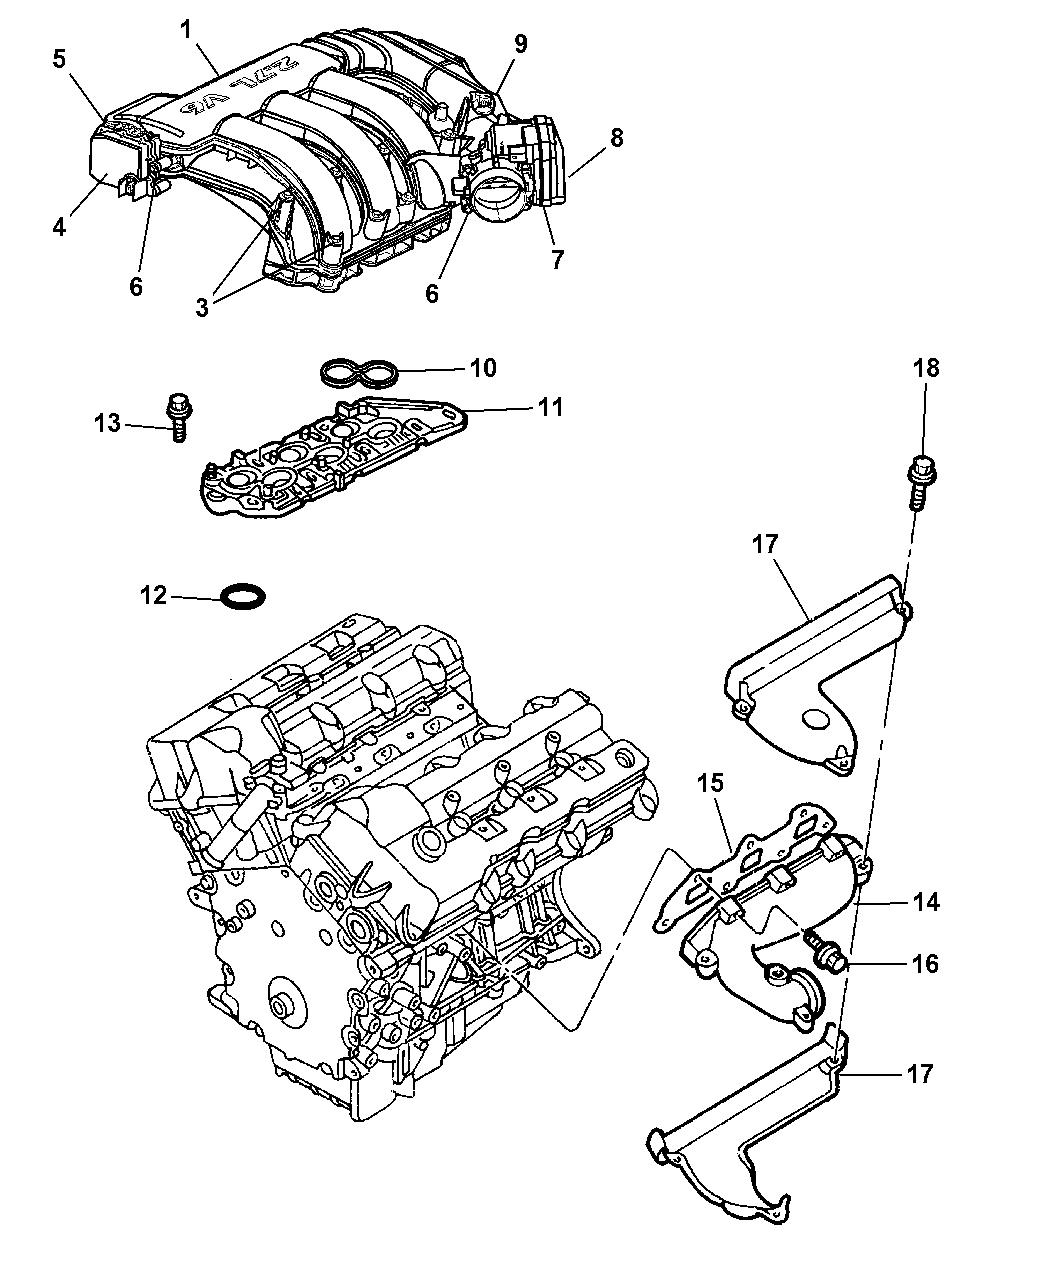 4591960ac genuine mopar manifold intake rh moparpartsgiant com North Star Engine Intake Exploded Diagram of Engine